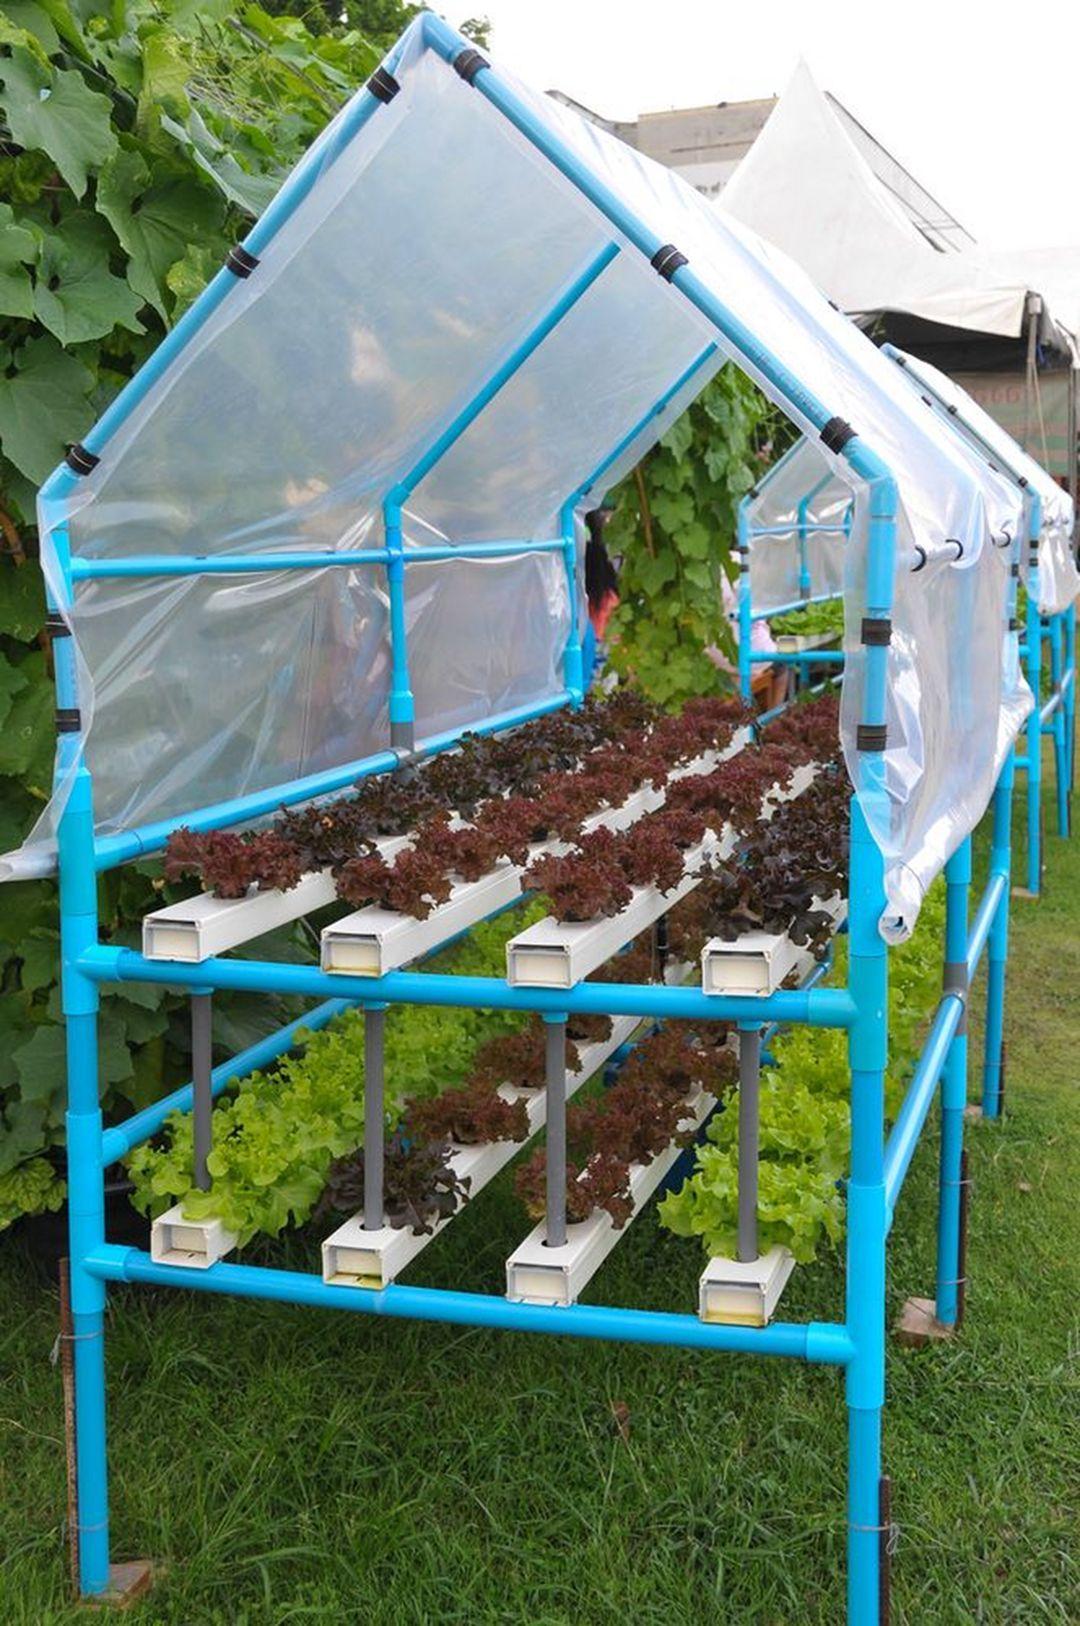 25+ Easy Hydroponic Garden Ideas For Good Alternative Garden in Your Home